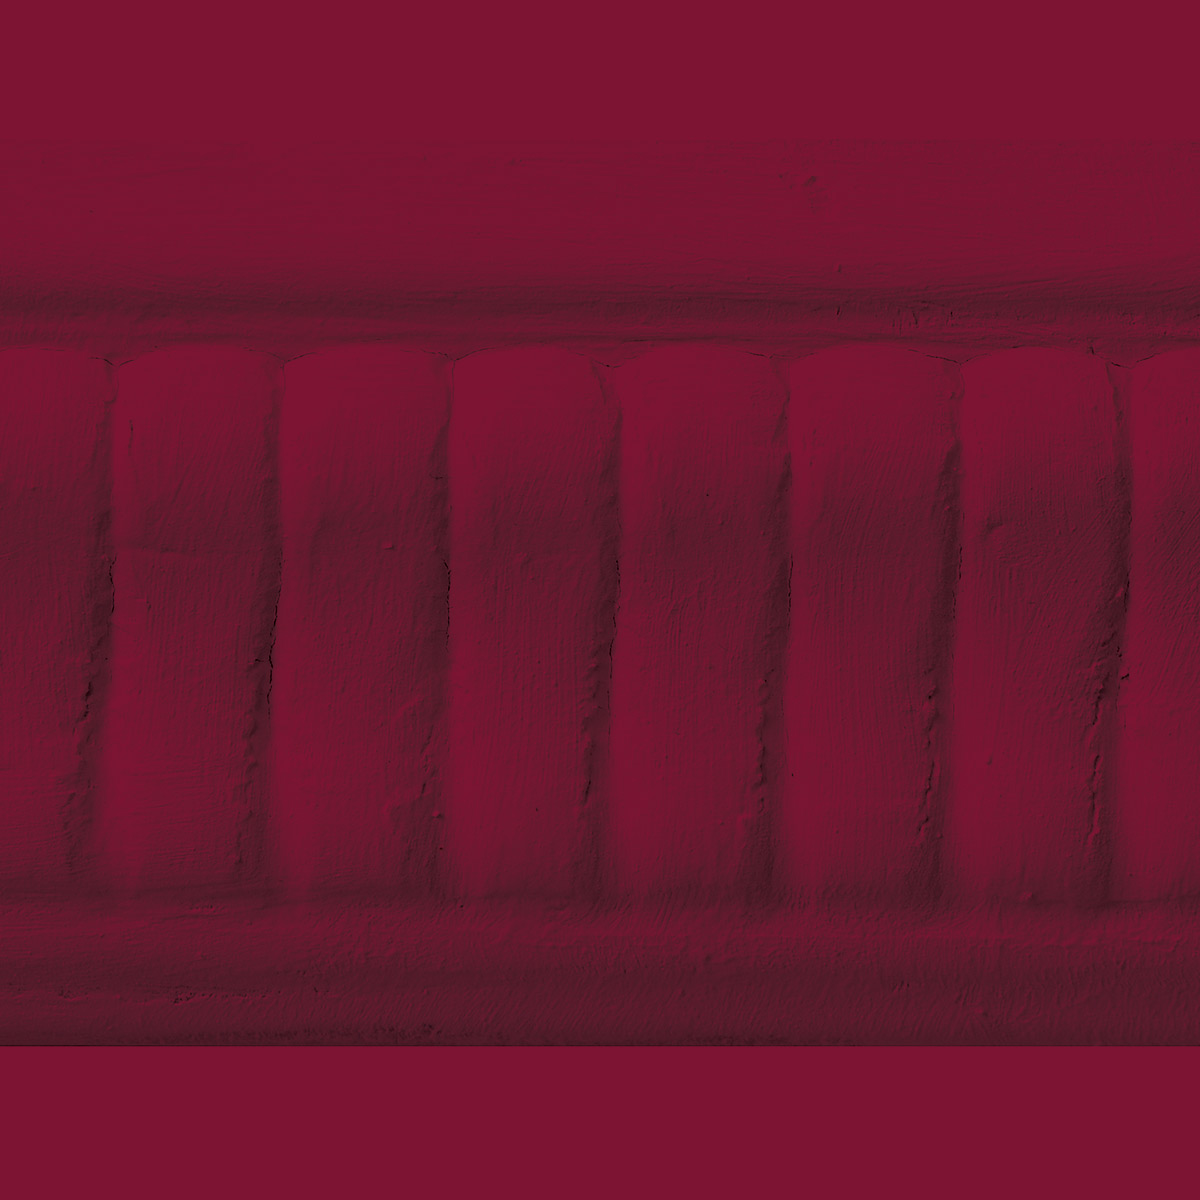 Waverly ® Inspirations Chalk Finish Acrylic Paint - Merlot, 8 oz. - 44634E